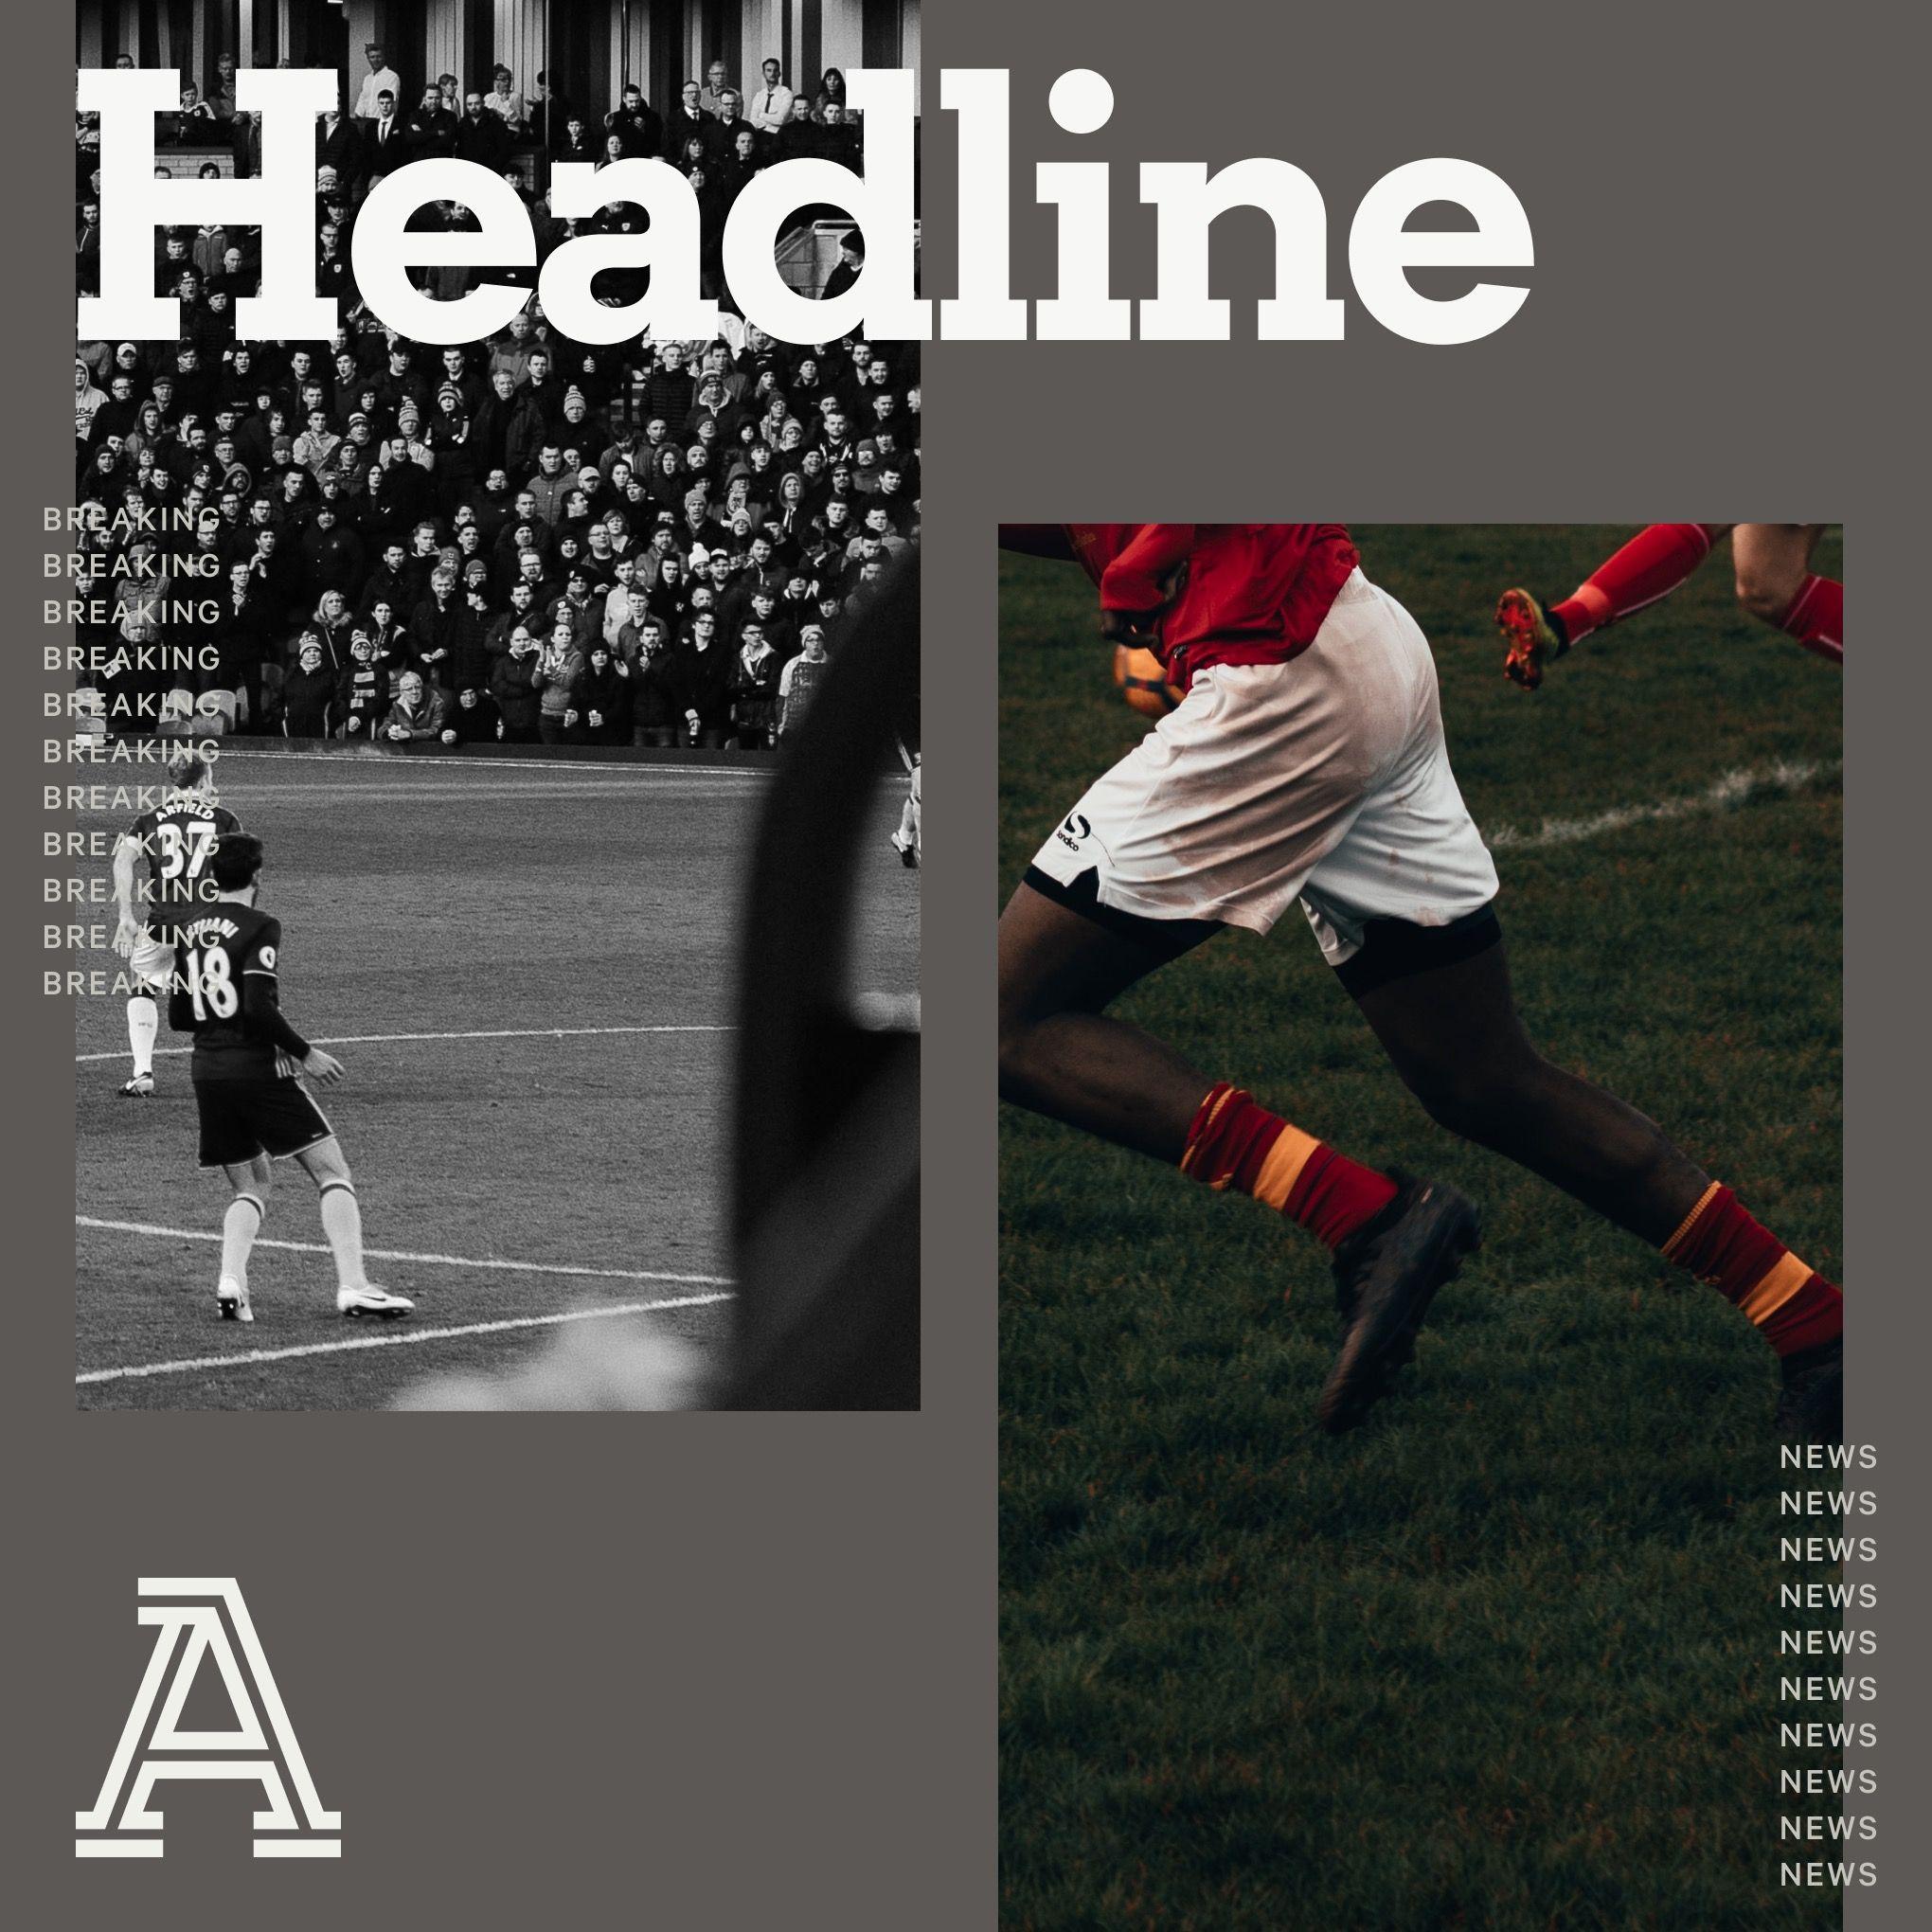 Headline: Breaking Football News From The Athletic UK